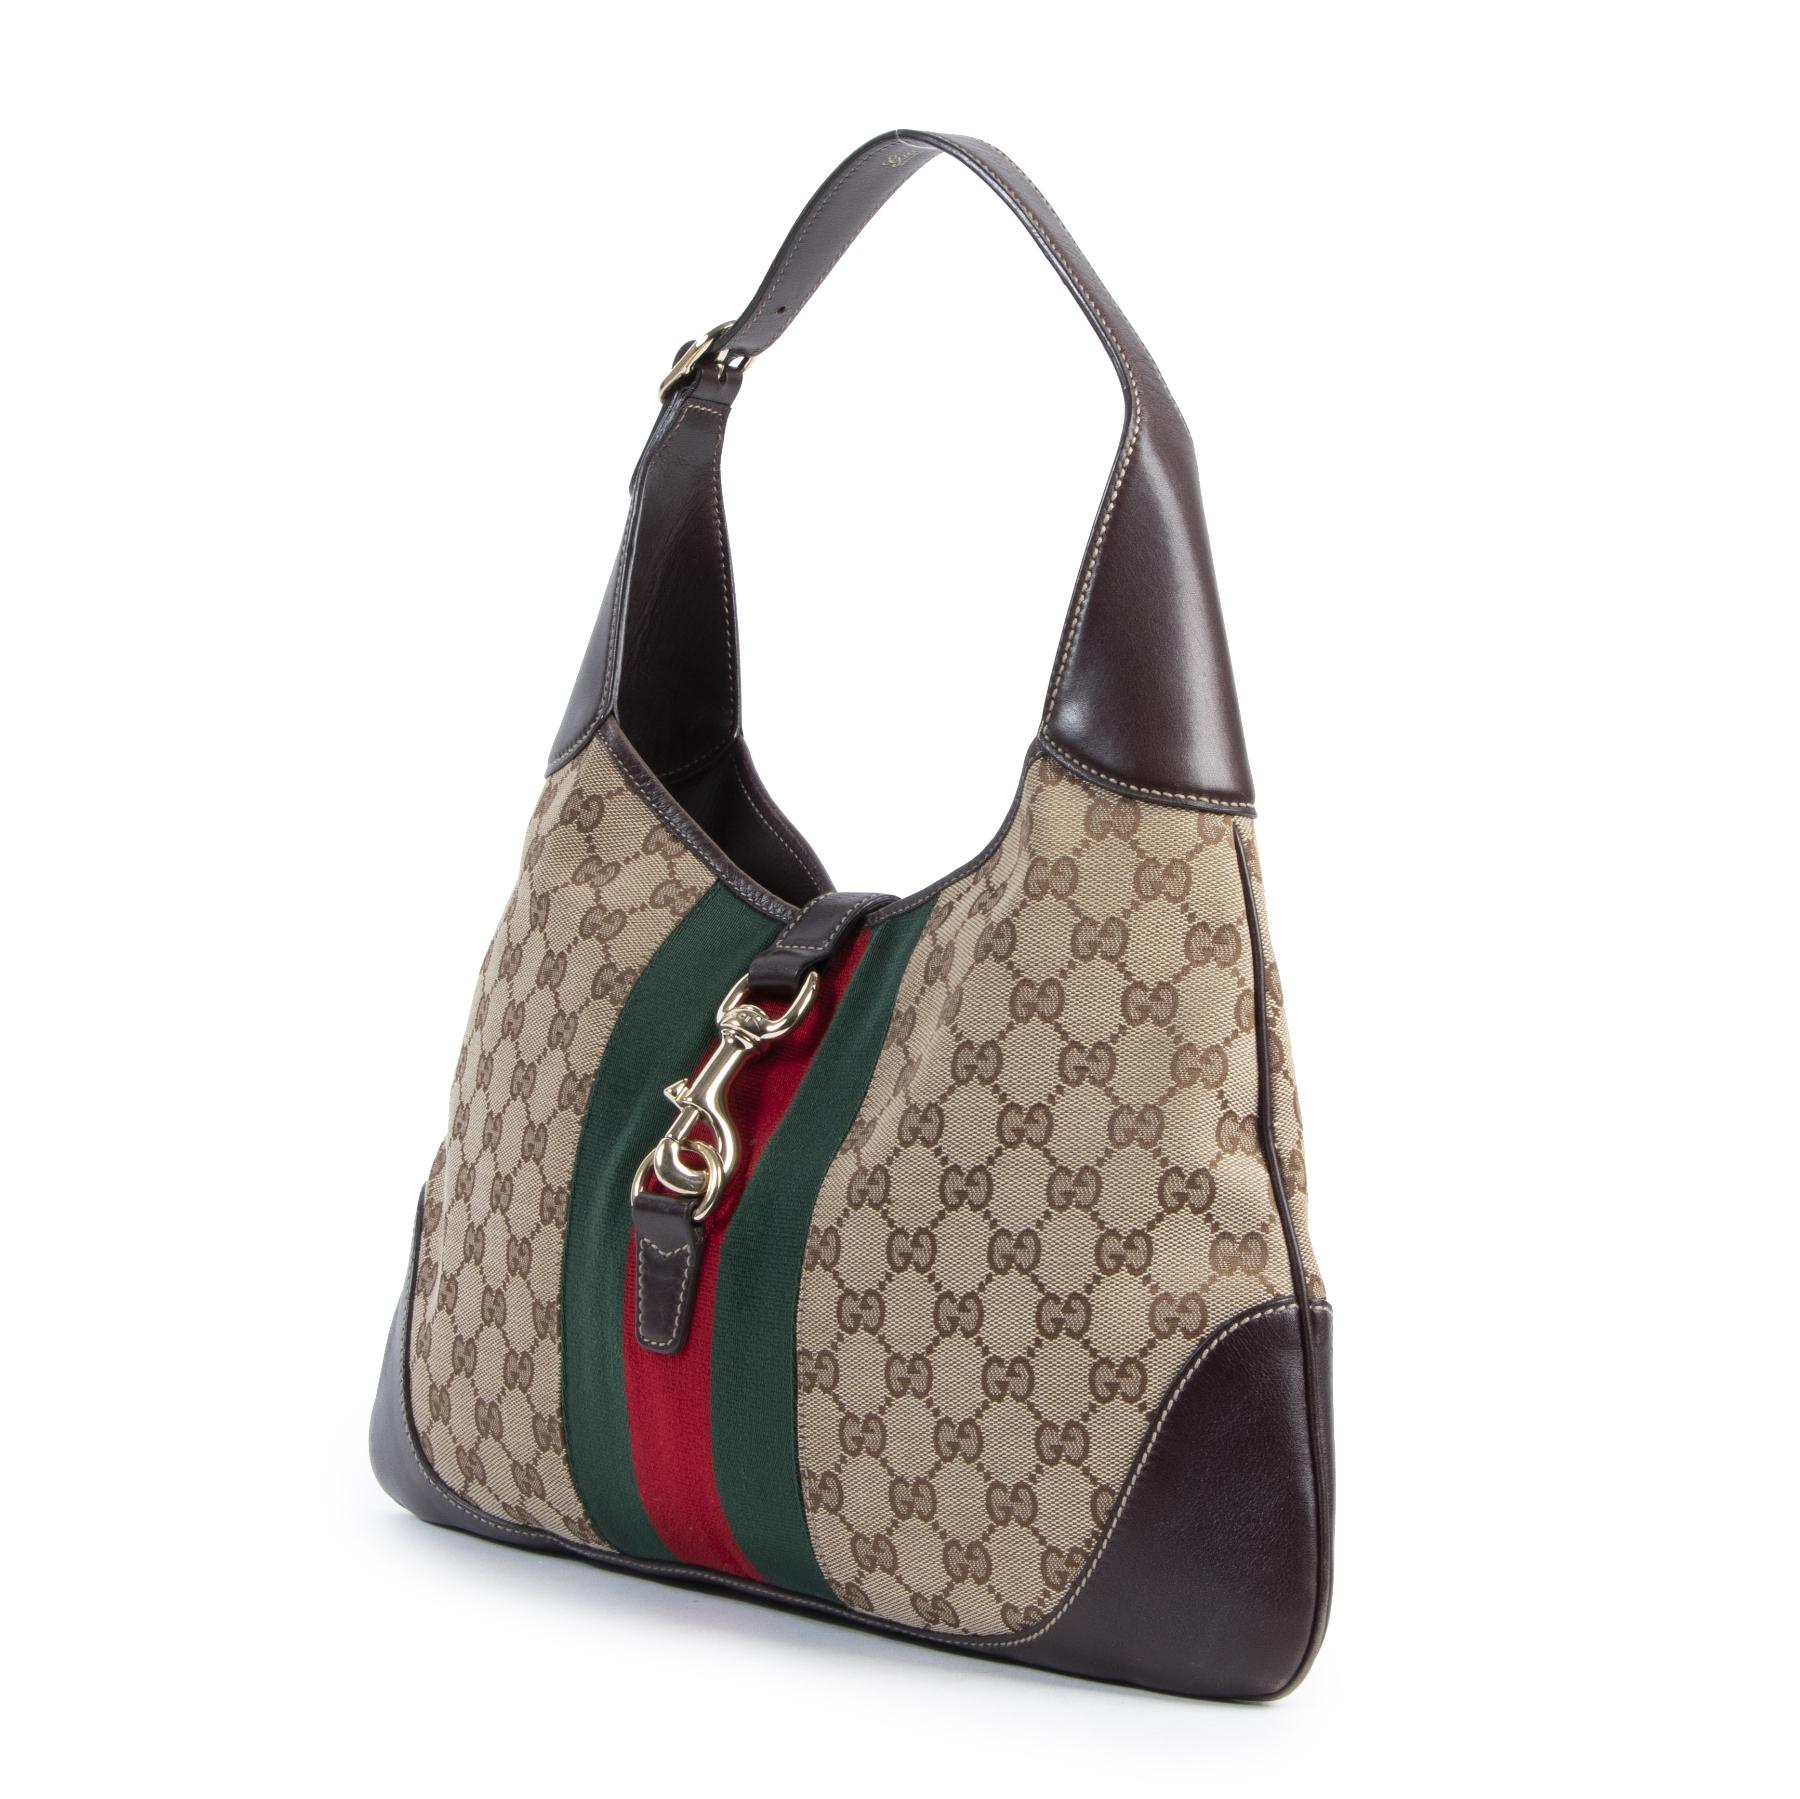 Gucci Jackie Original GG Canvas Shoulder Bag kopen en verkopen bij Labellov luxe vintage designer